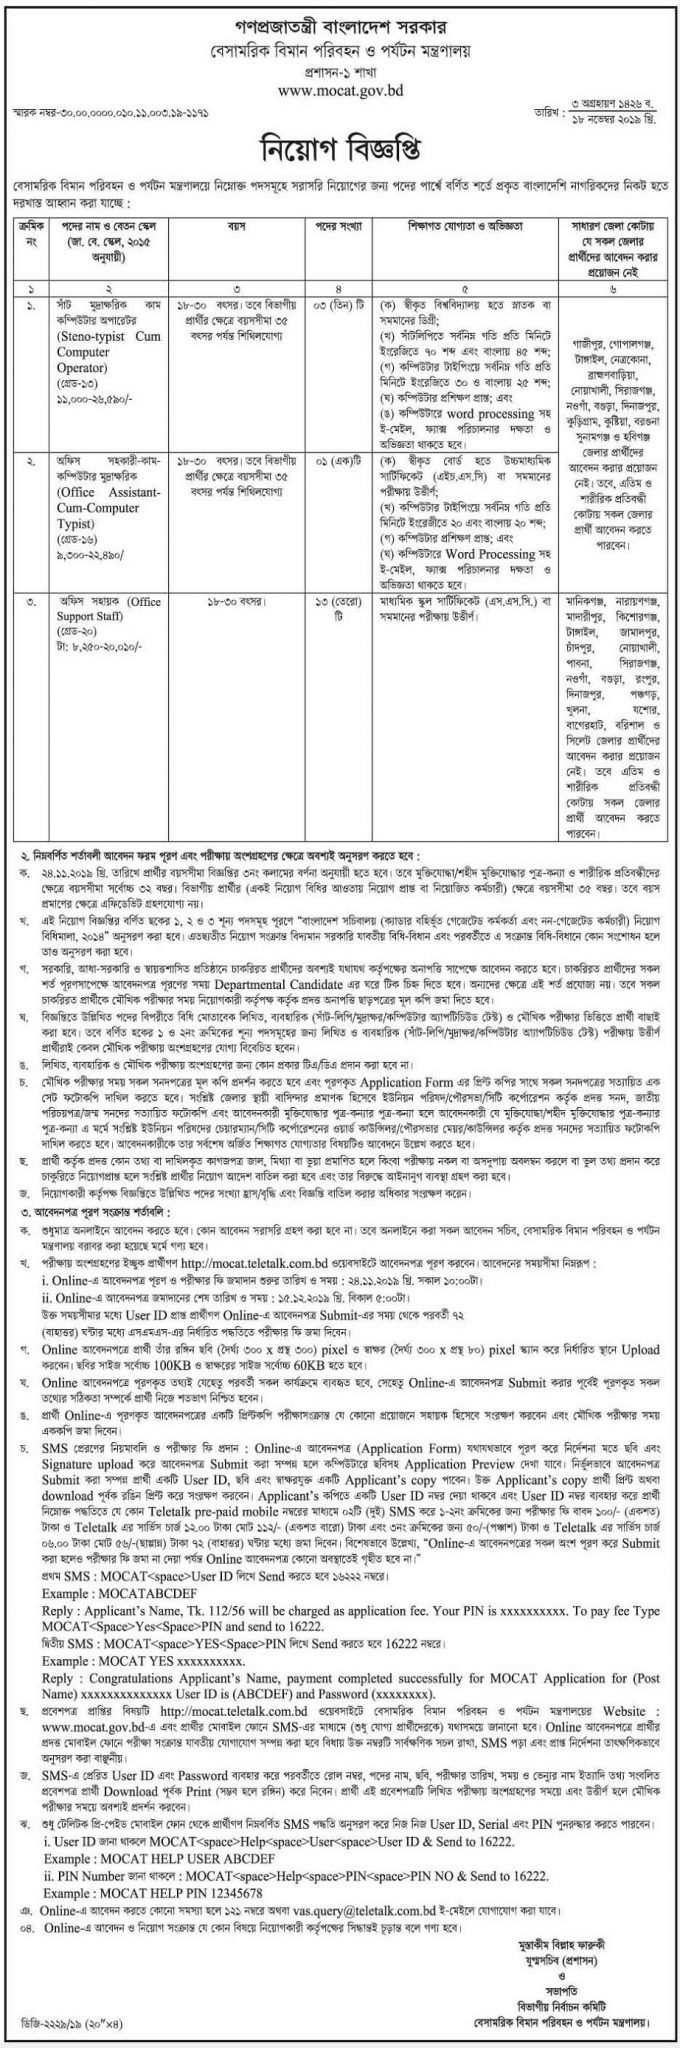 Ministry of Civil Aviation and Tourism Job Circular 2019